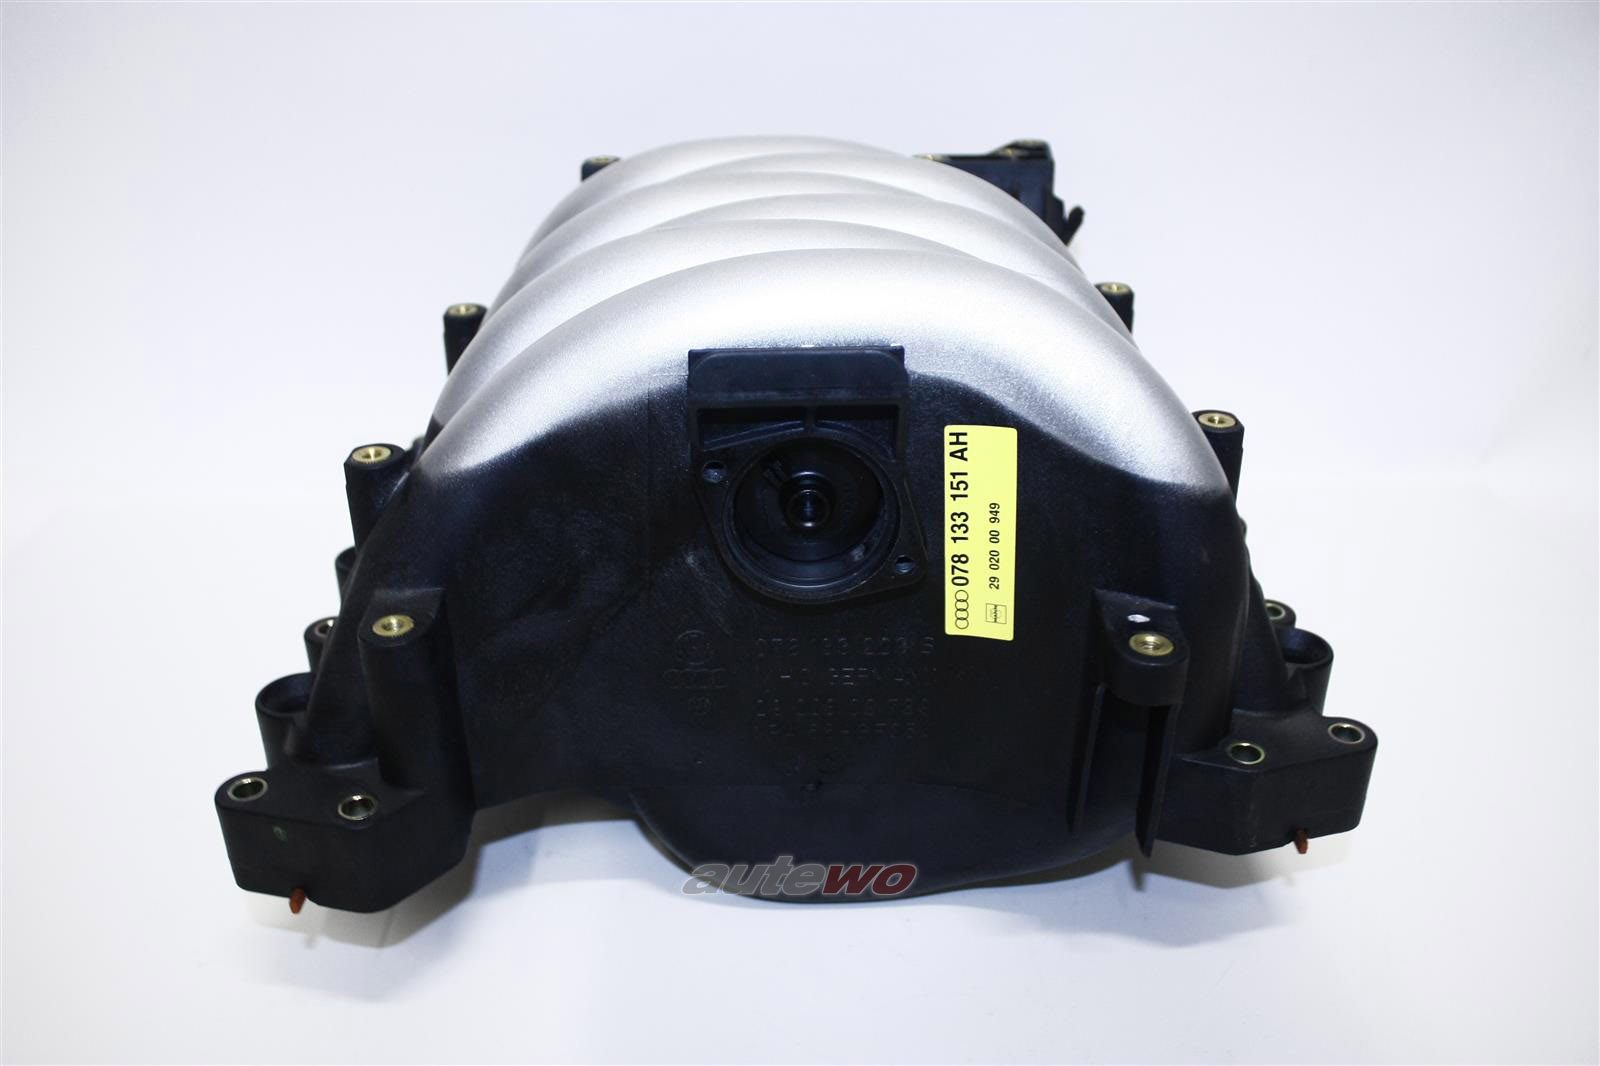 078133201BA NEU Audi/VW A4 B5/A6 4B/Passat 2.4-2.8l Schaltsaugrohr